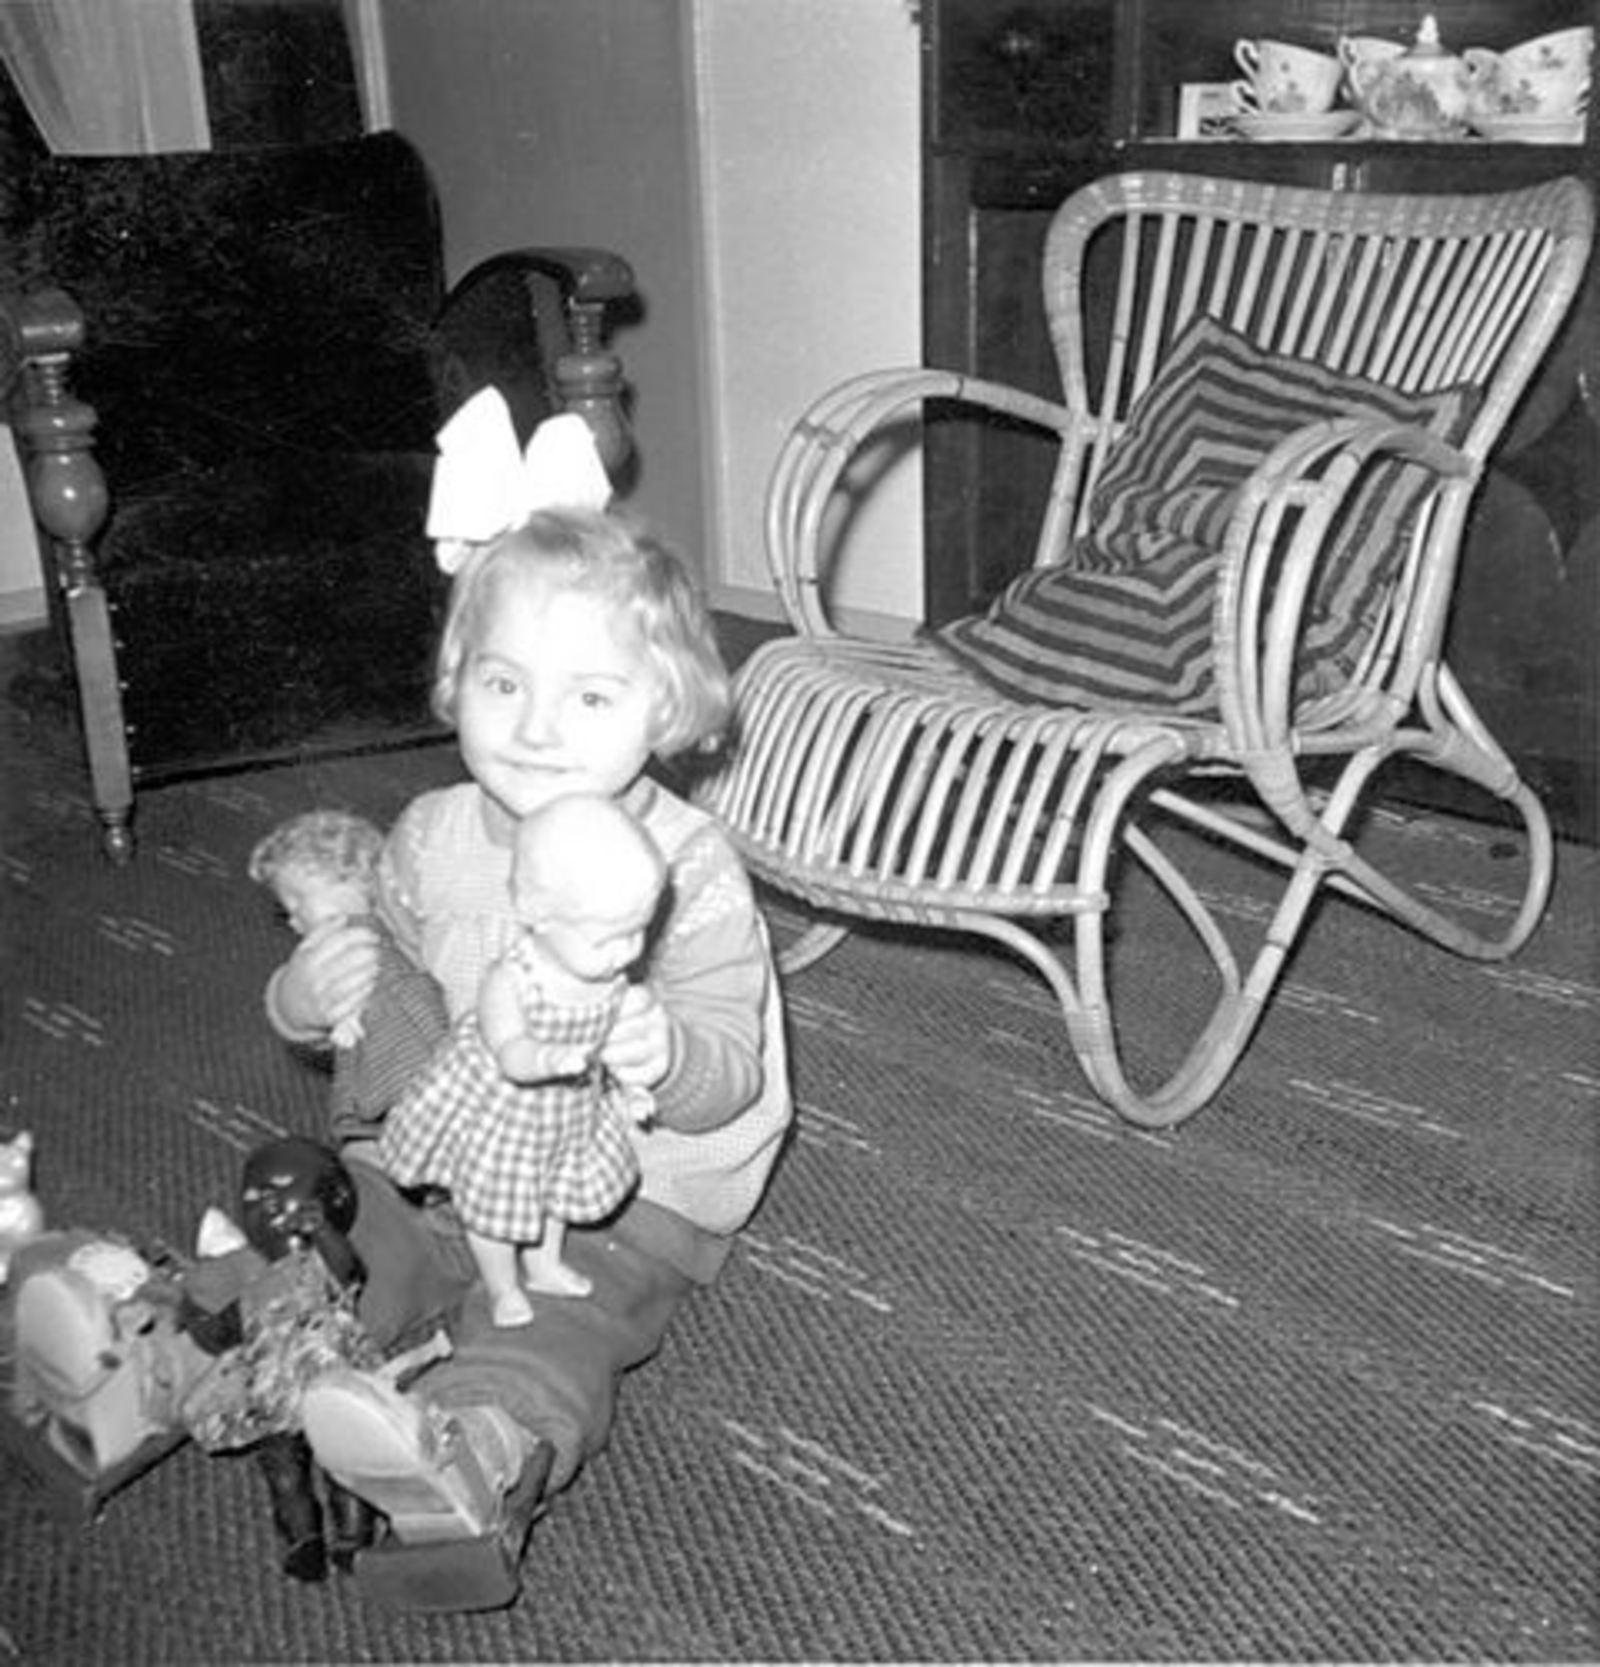 Bliek Gerrit 1917 1962-63 dochter Leentje binnen met Poppen